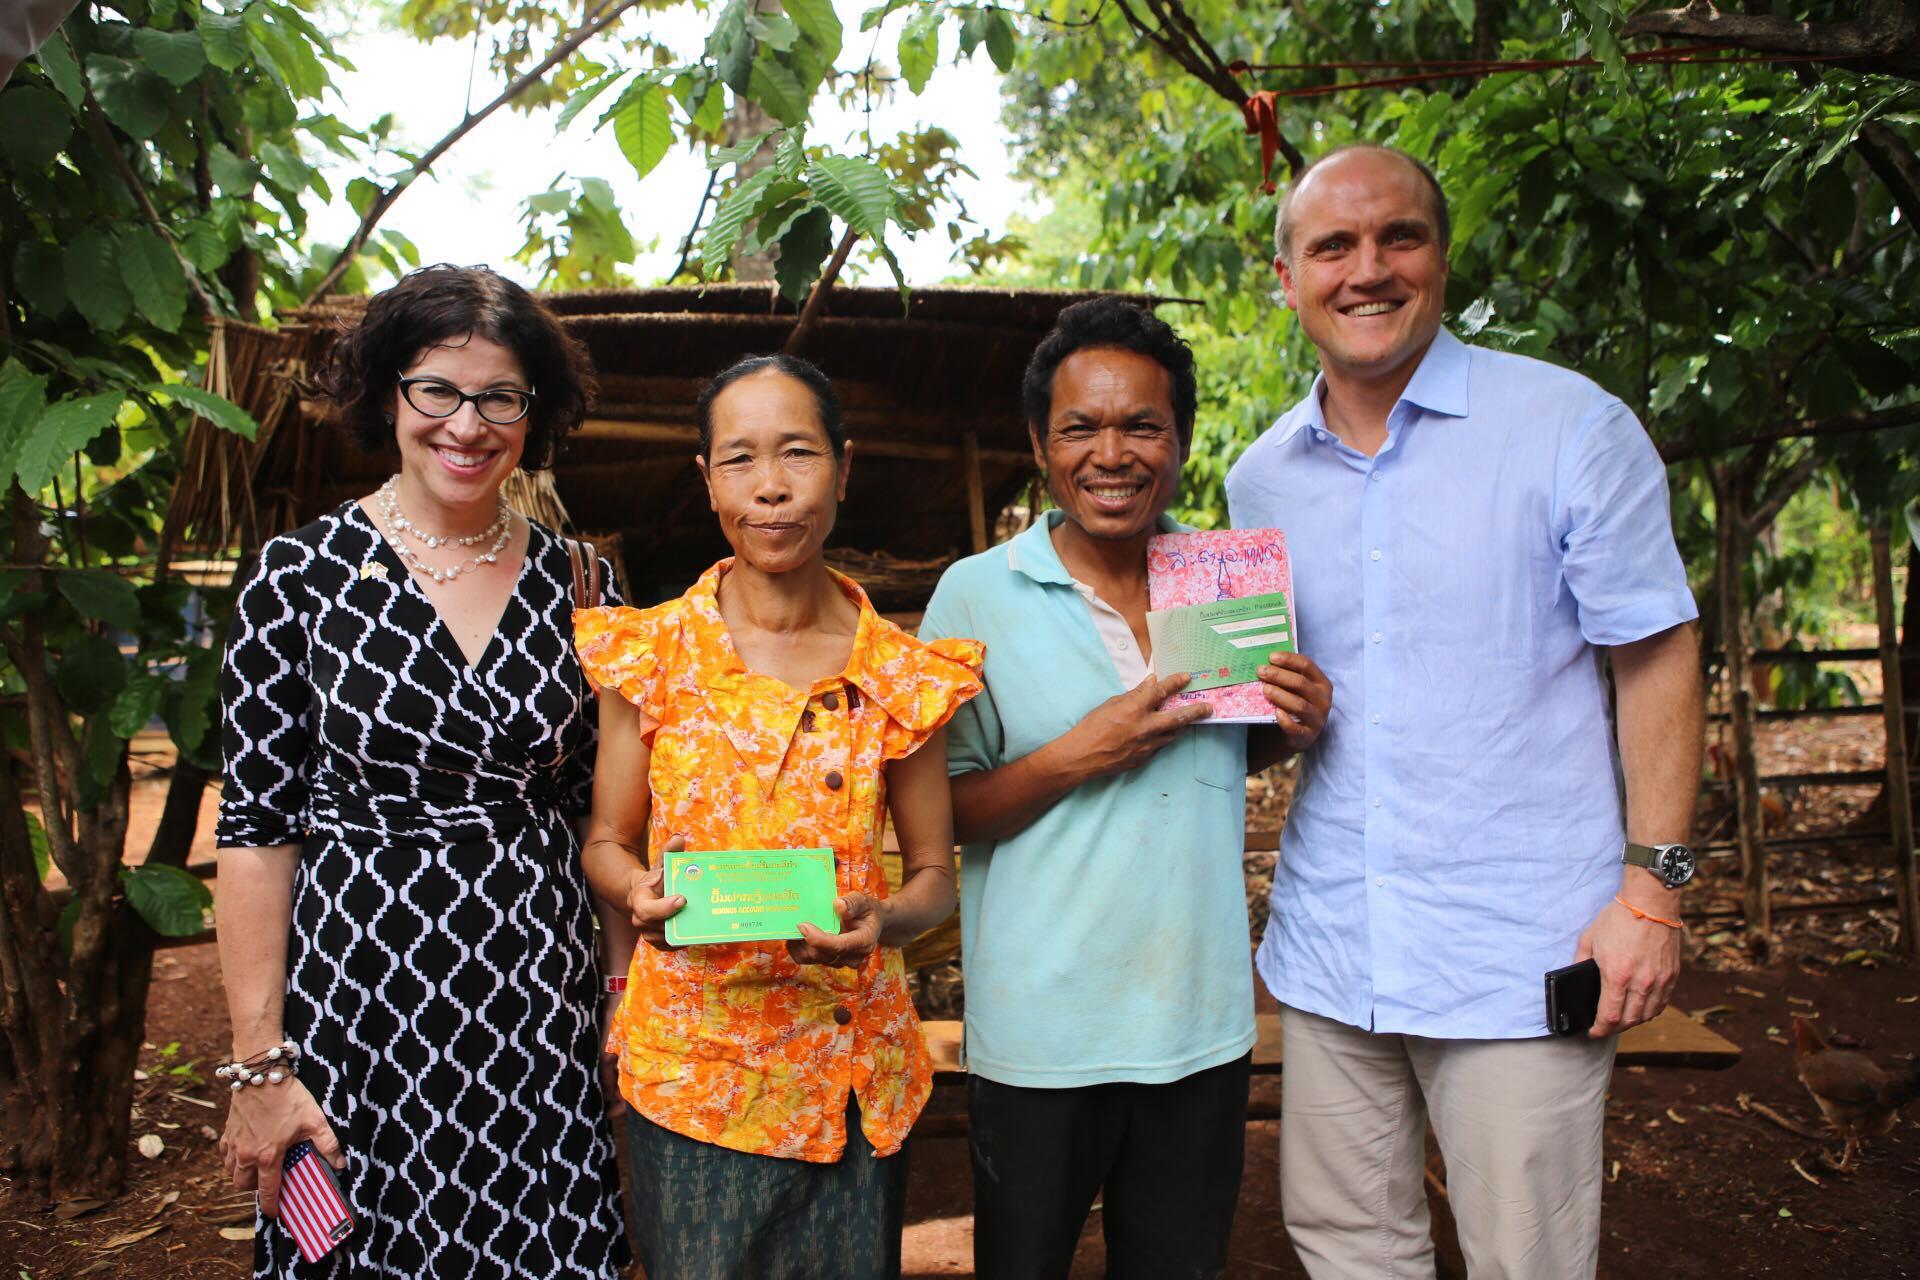 U.S. & Australian Ambassadors to Laos visit World Education livelihoods project in Laos